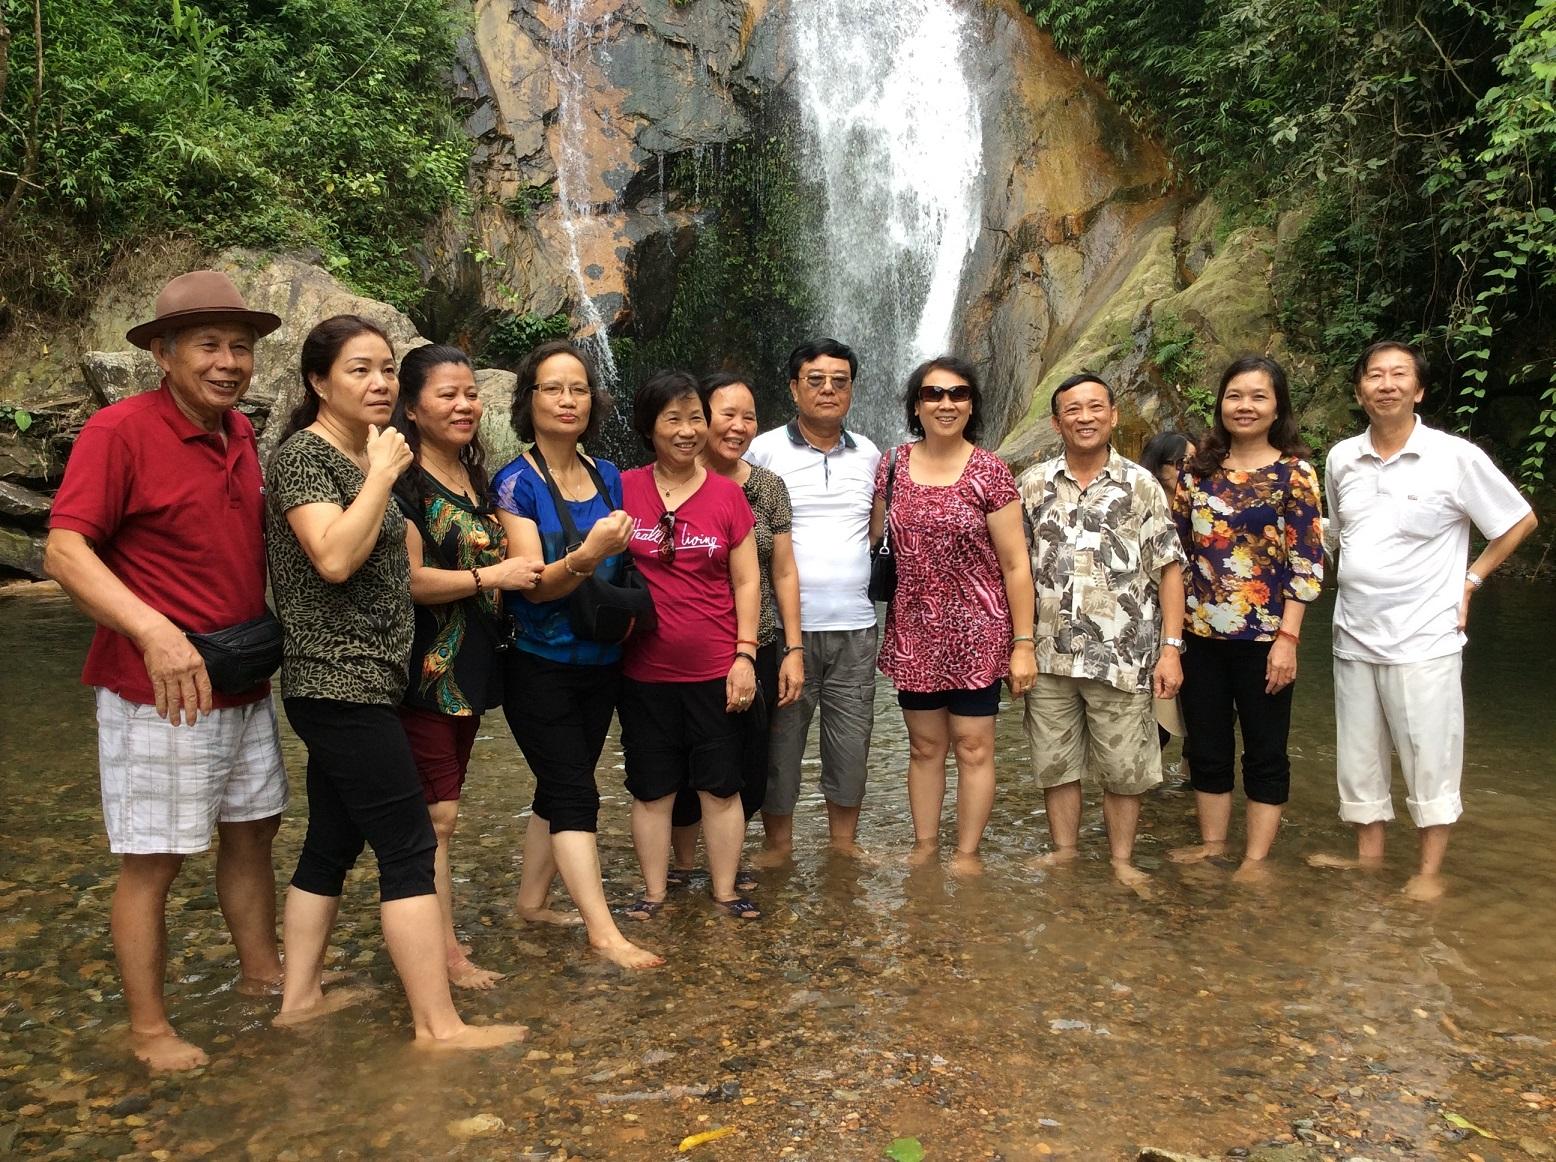 du lịch Phú Thọ 3